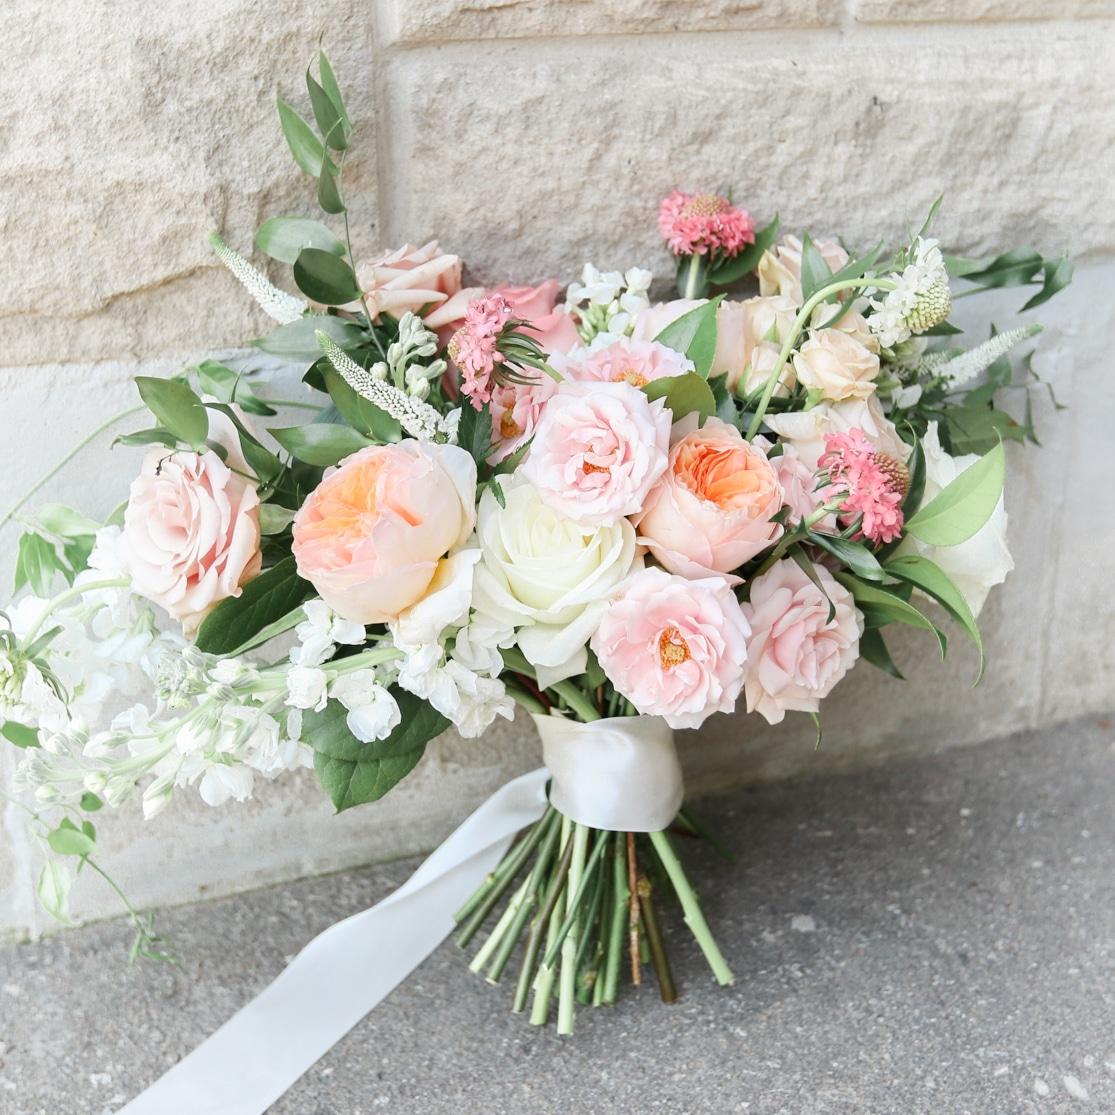 FloralBash premium wedding florist near Mississauga